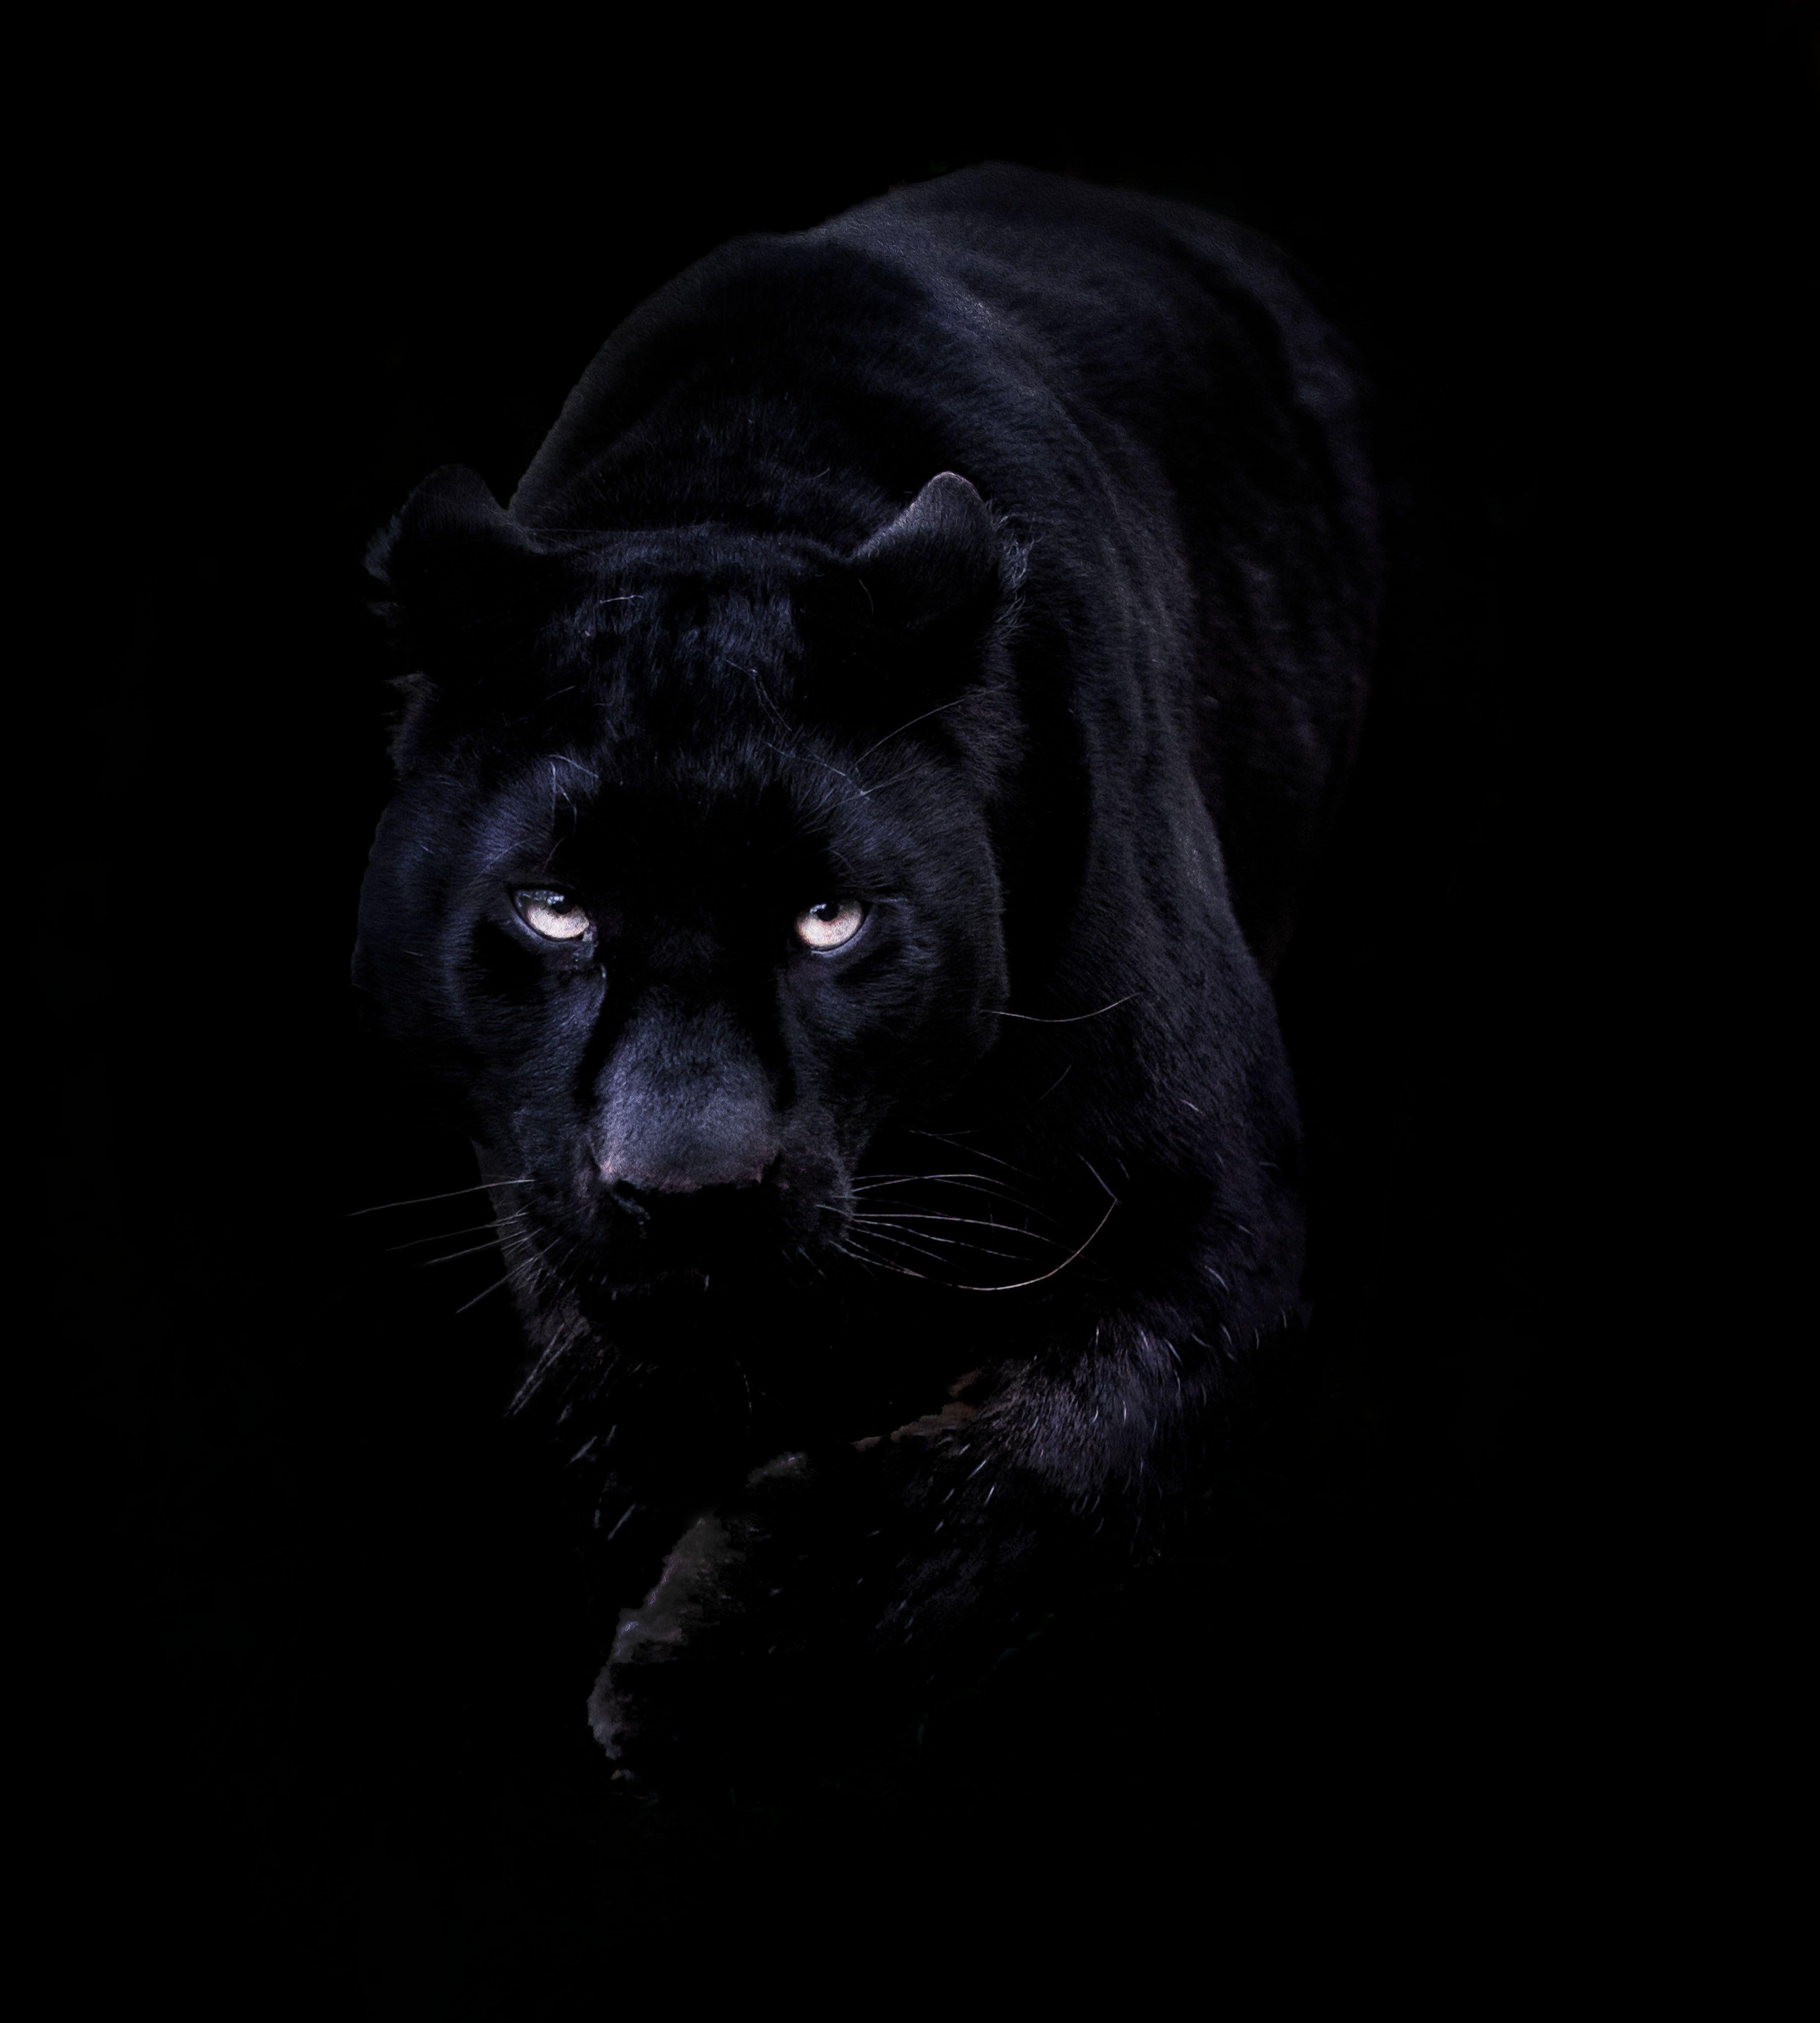 Black Jaguar Hd Wallpapers Top Free Black Jaguar Hd Backgrounds Wallpaperaccess